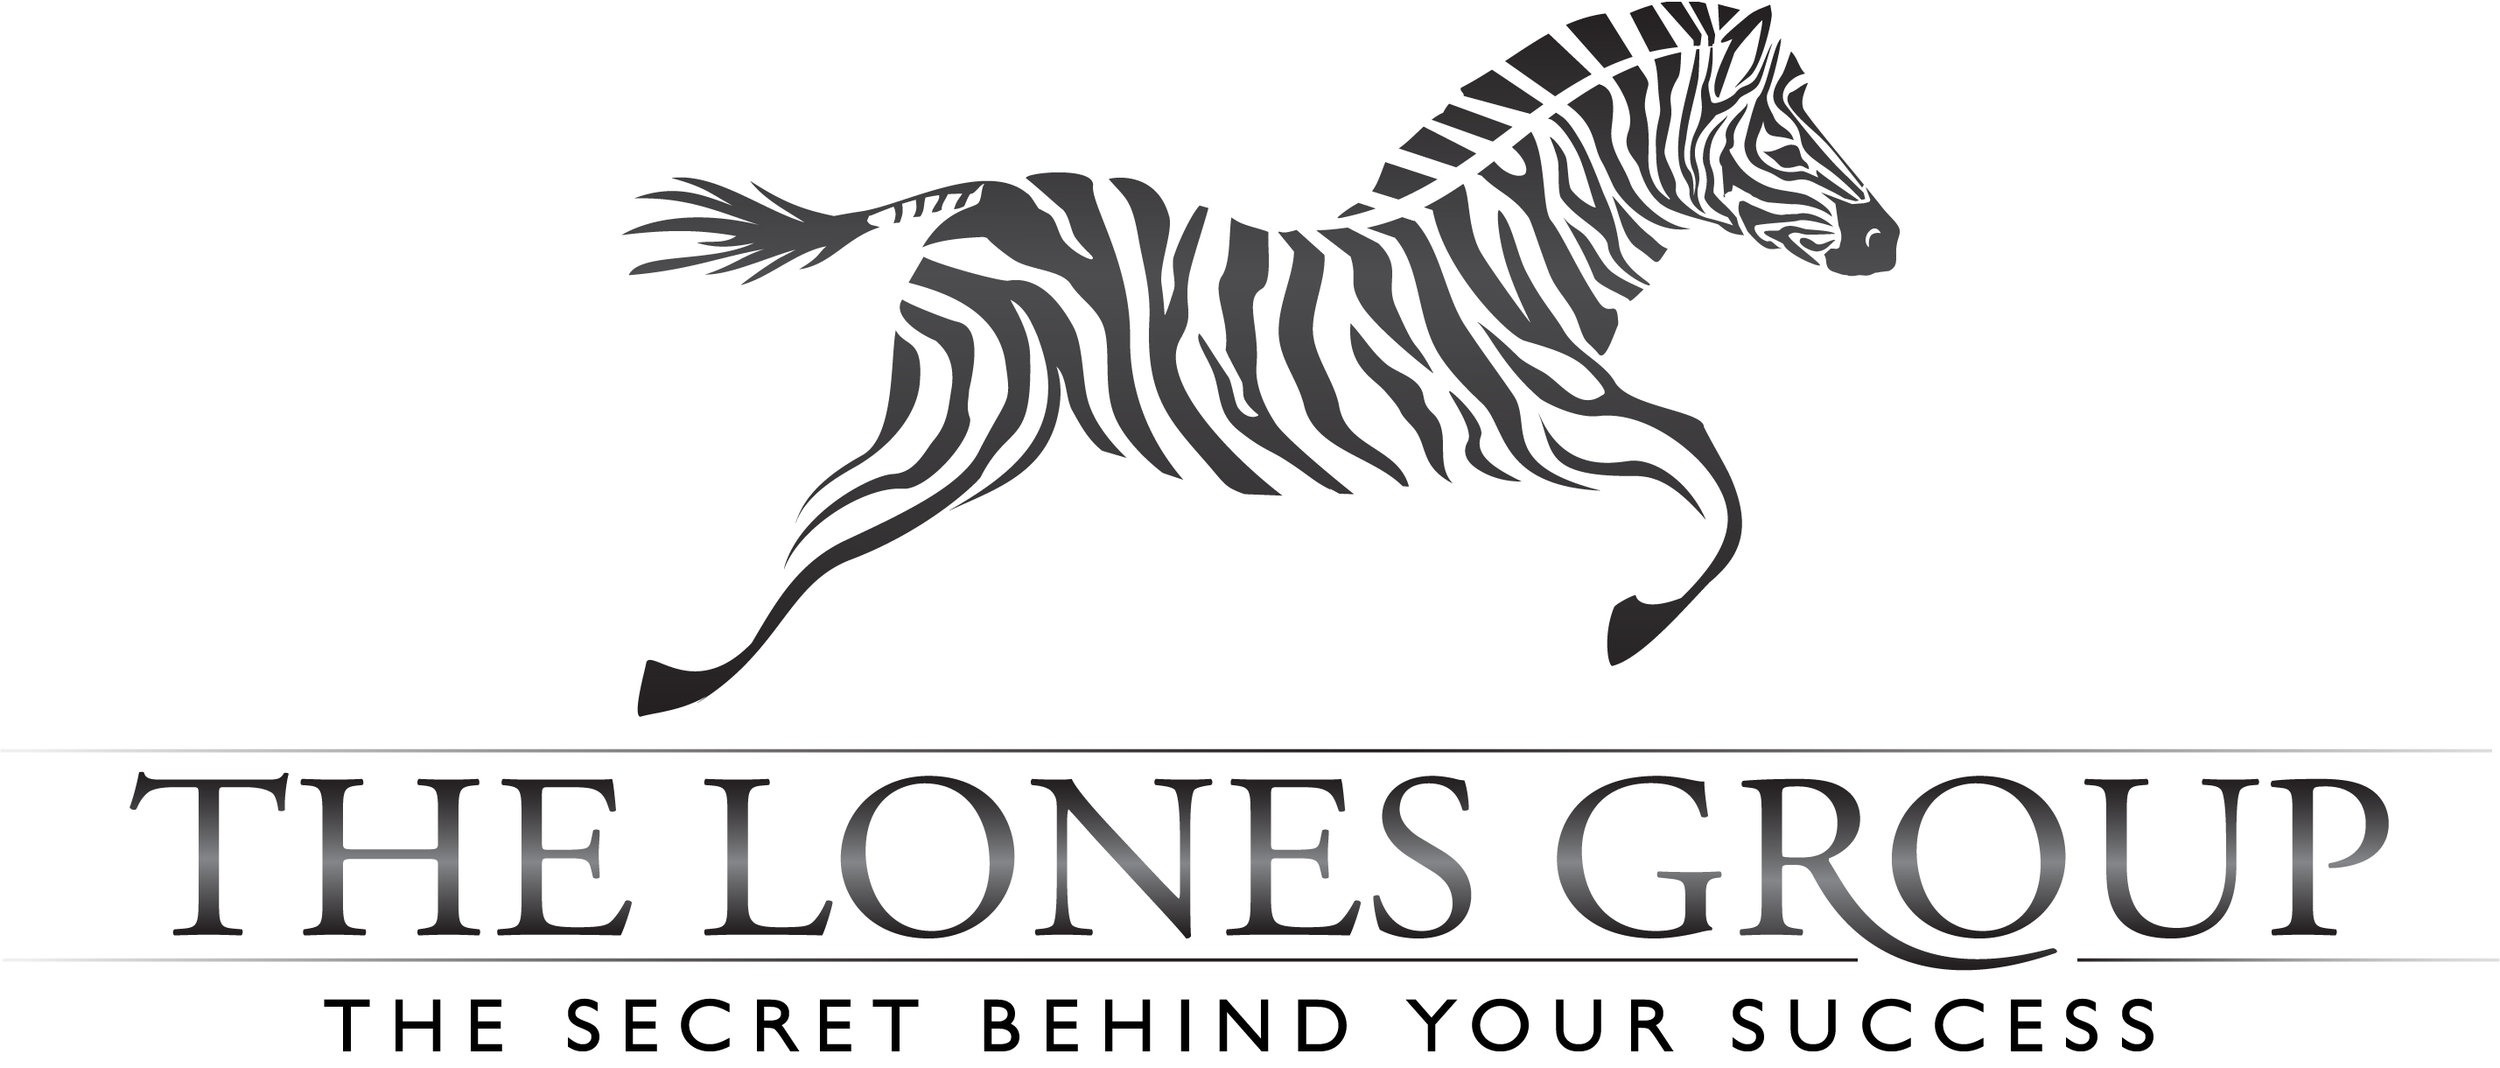 The Lones Group Logo - Dark.jpg